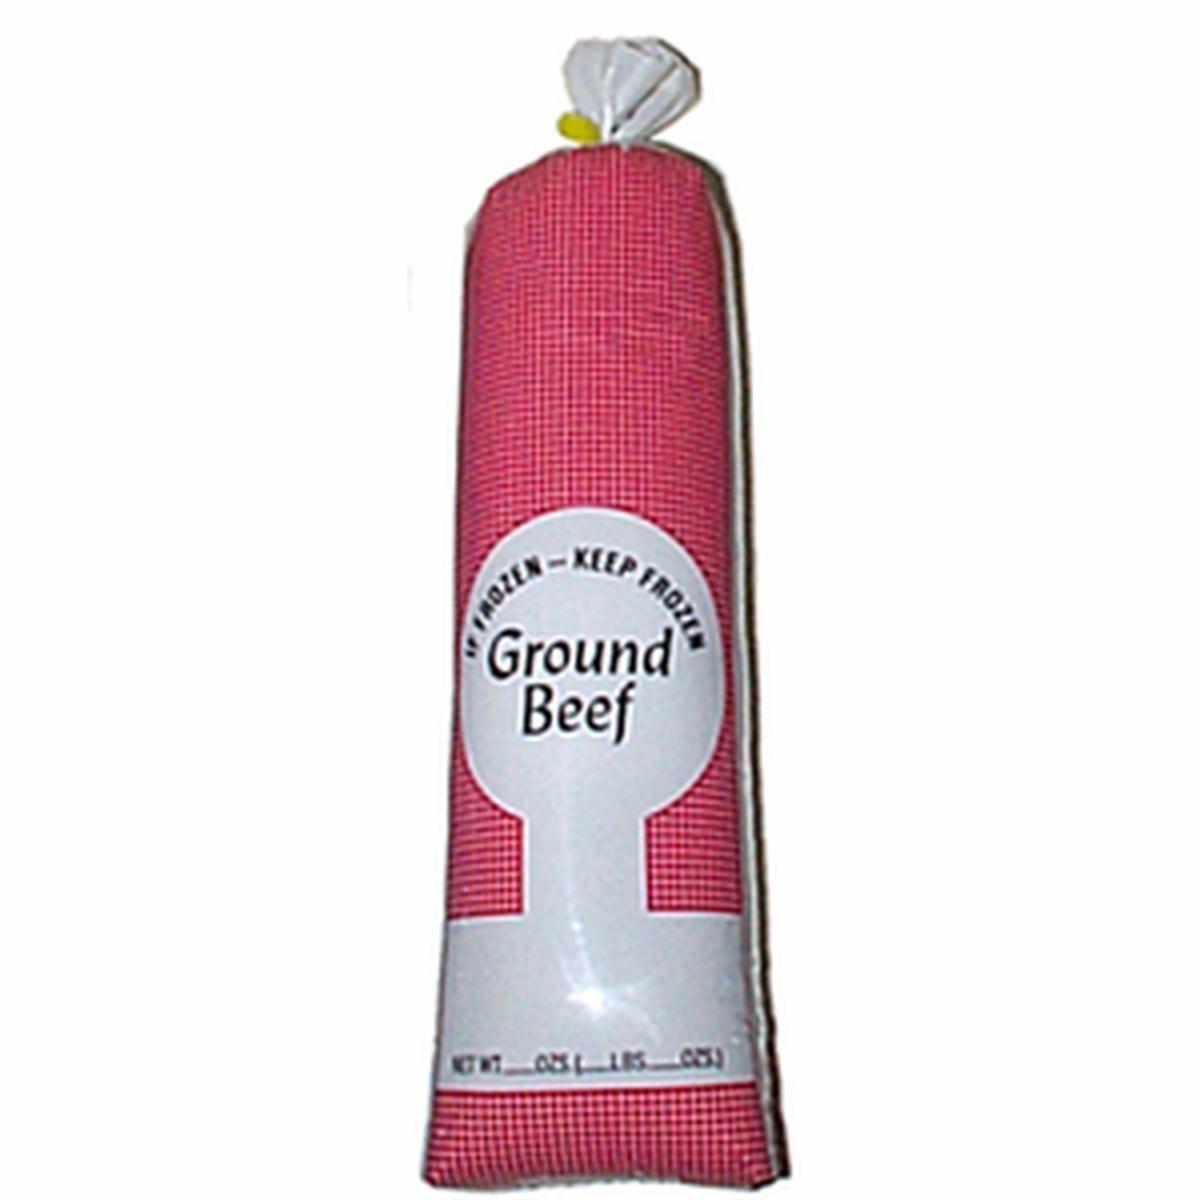 ground beef bag__93925.1383845782.jpg